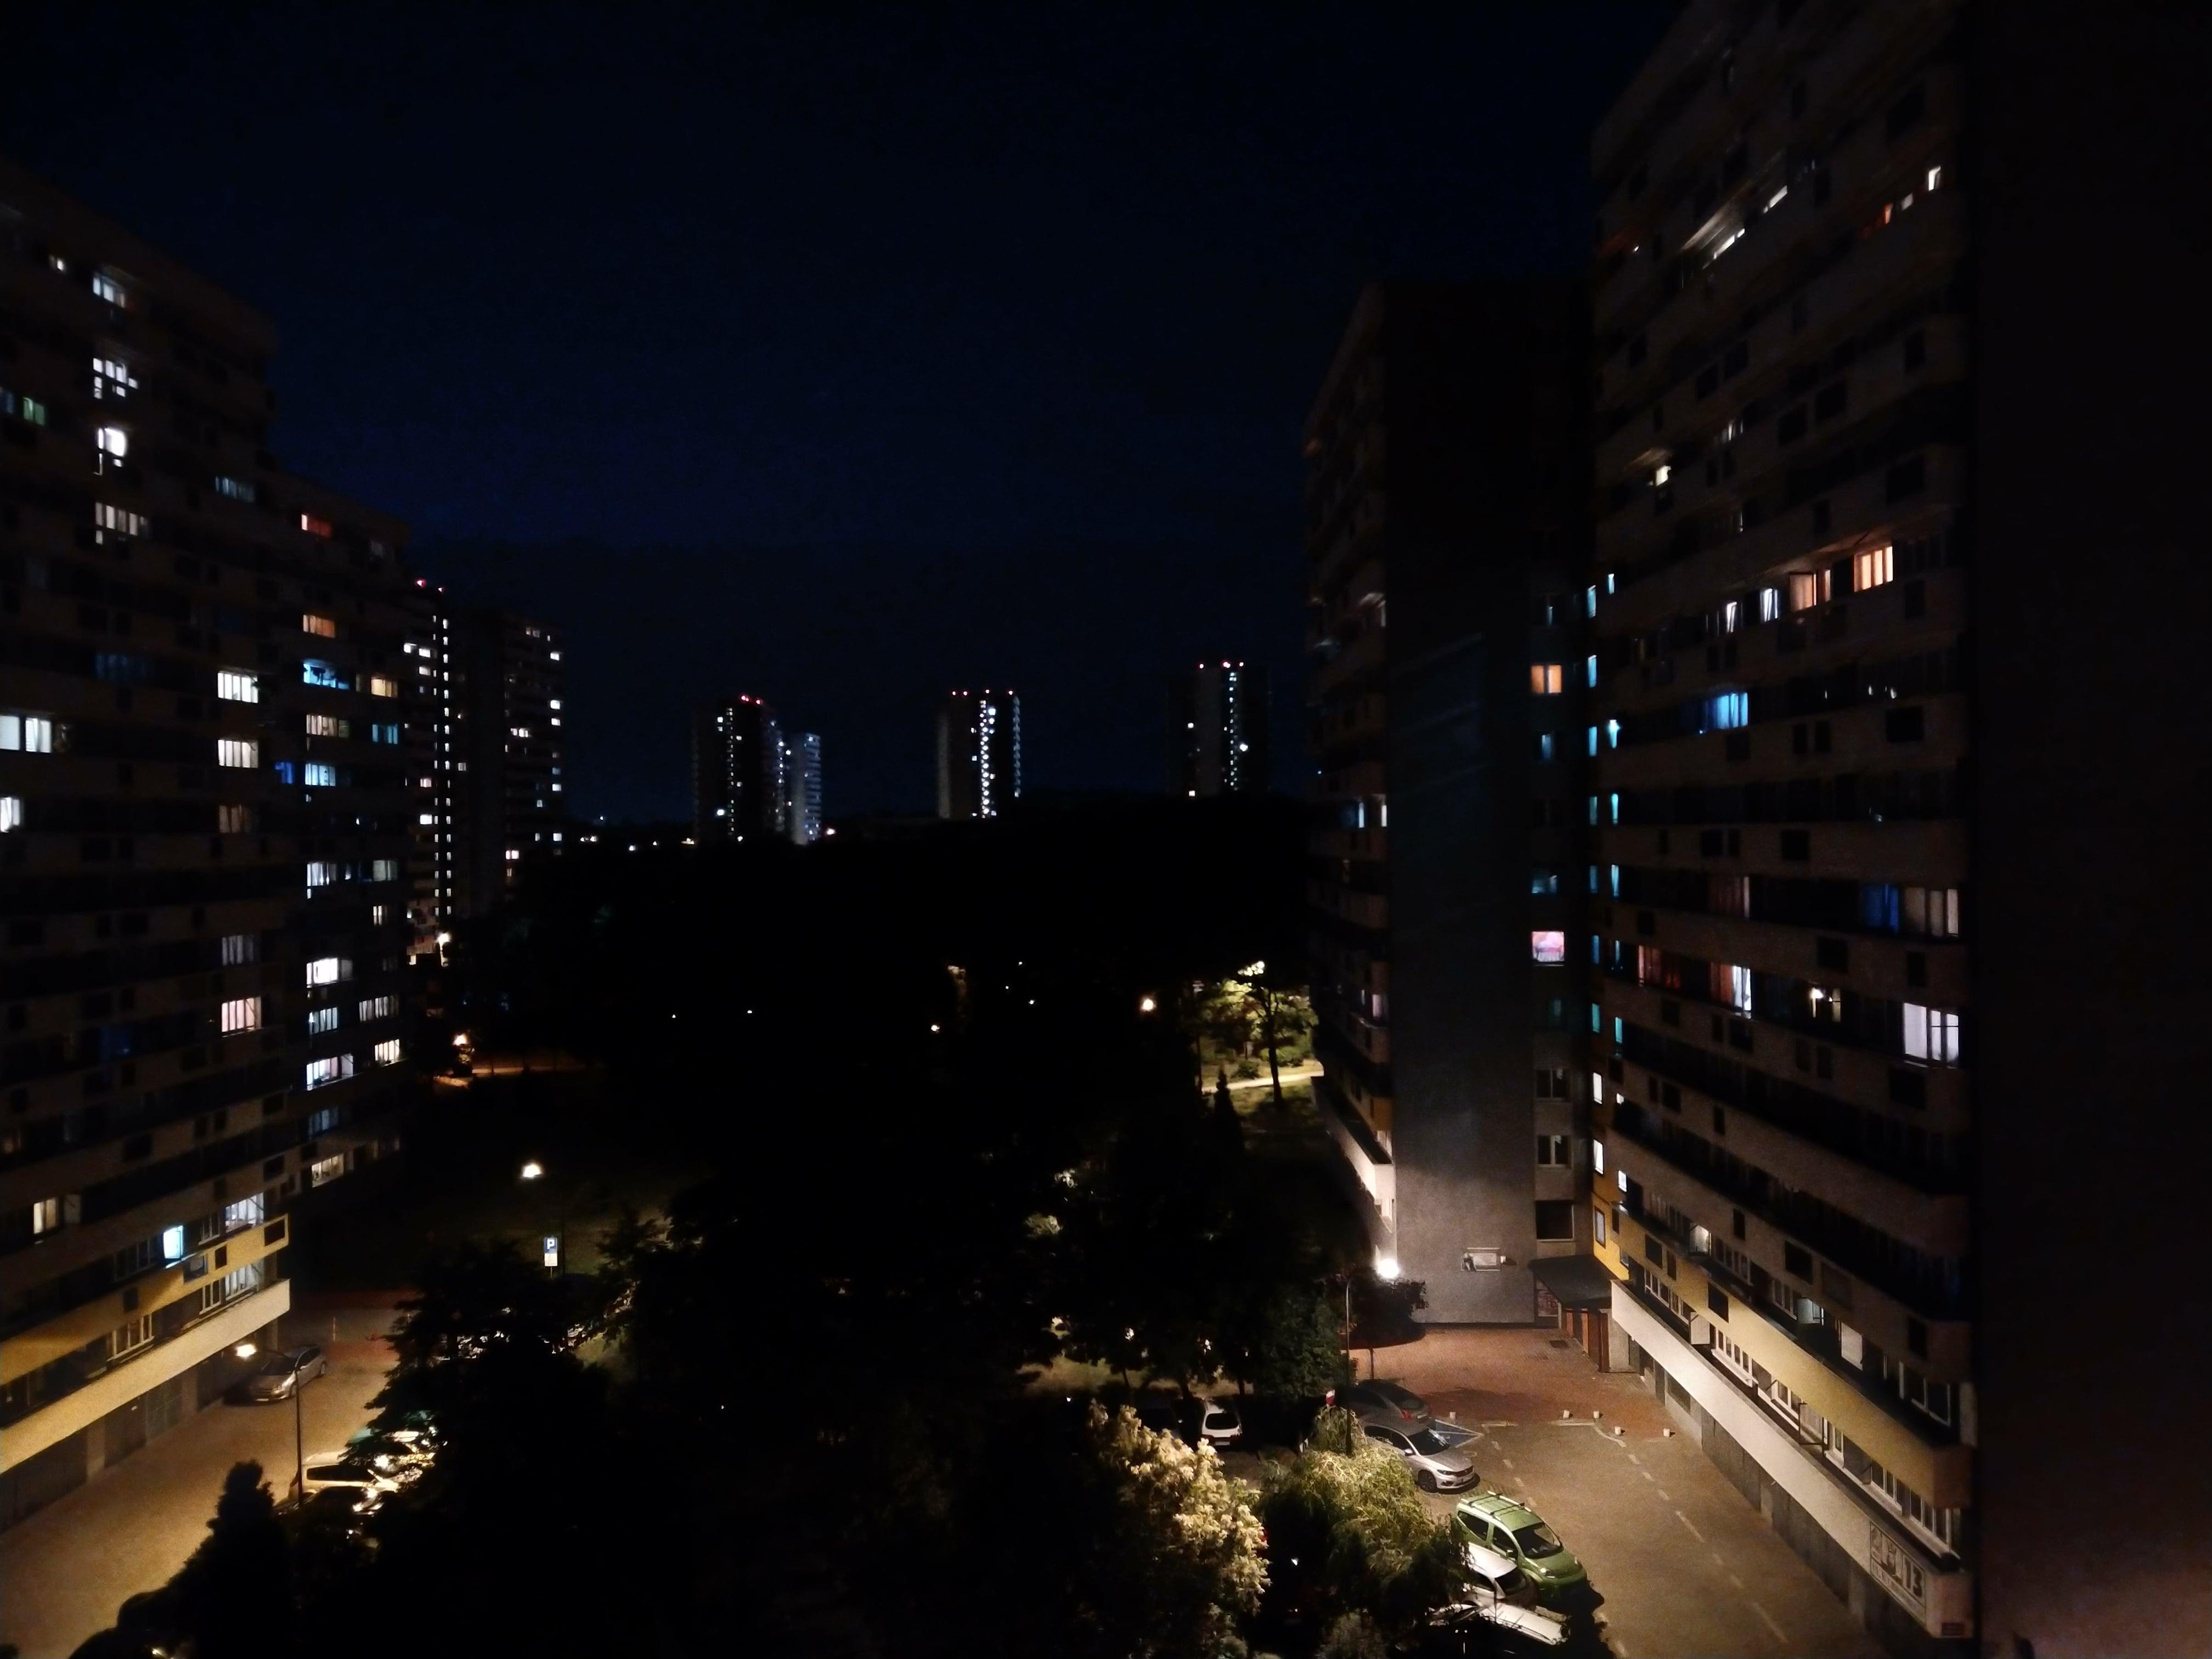 Zdjęcia nocne - Sharp Aquos C10